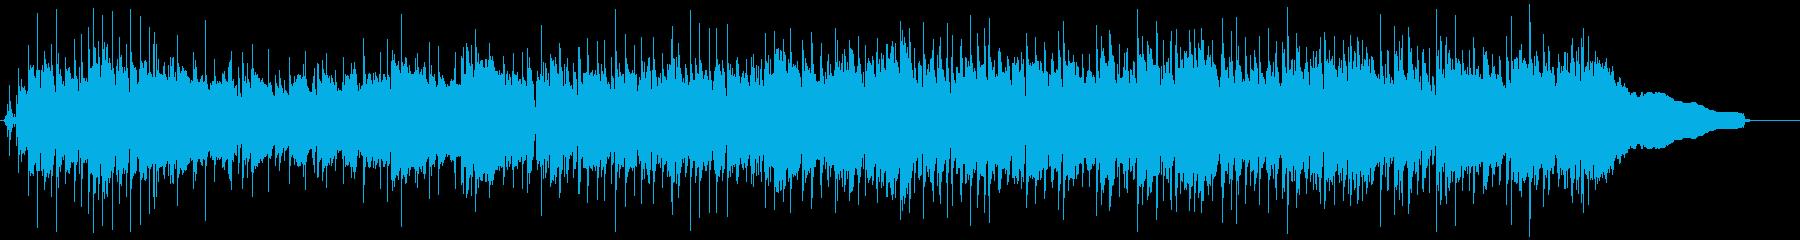 VP15B、爽やか、生アコギ・ポップの再生済みの波形